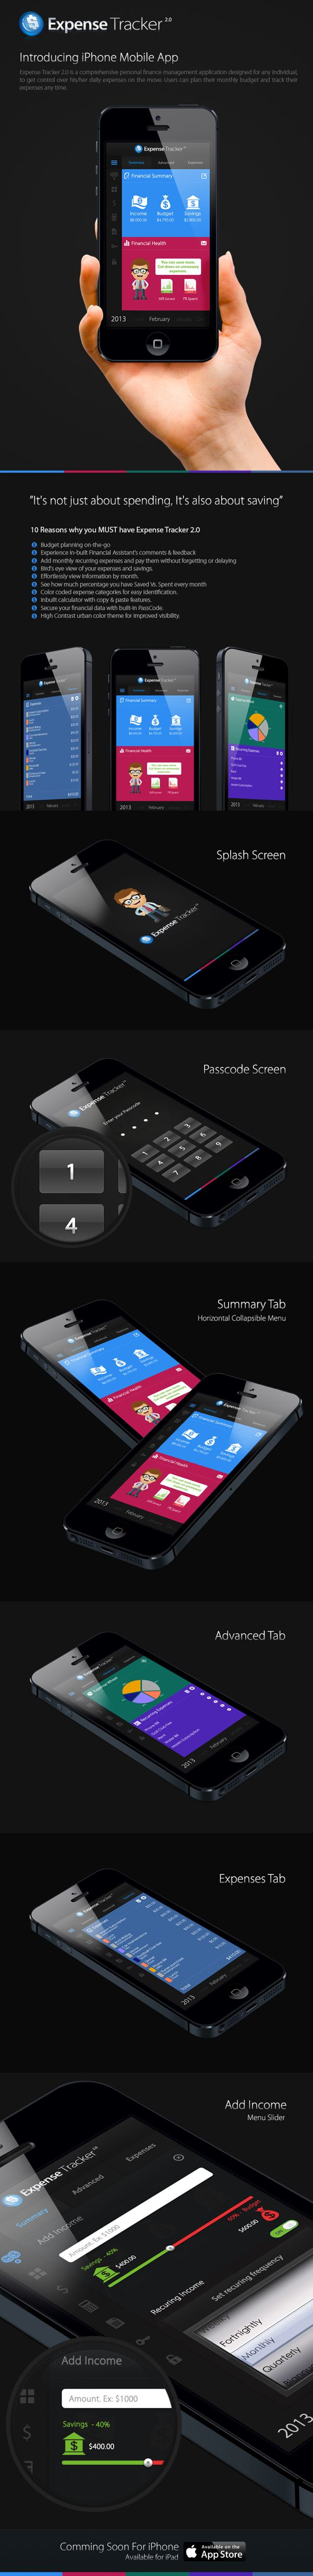 Expense Tracker 2.0 - iPhone App by ceffectz Designs, via Behance